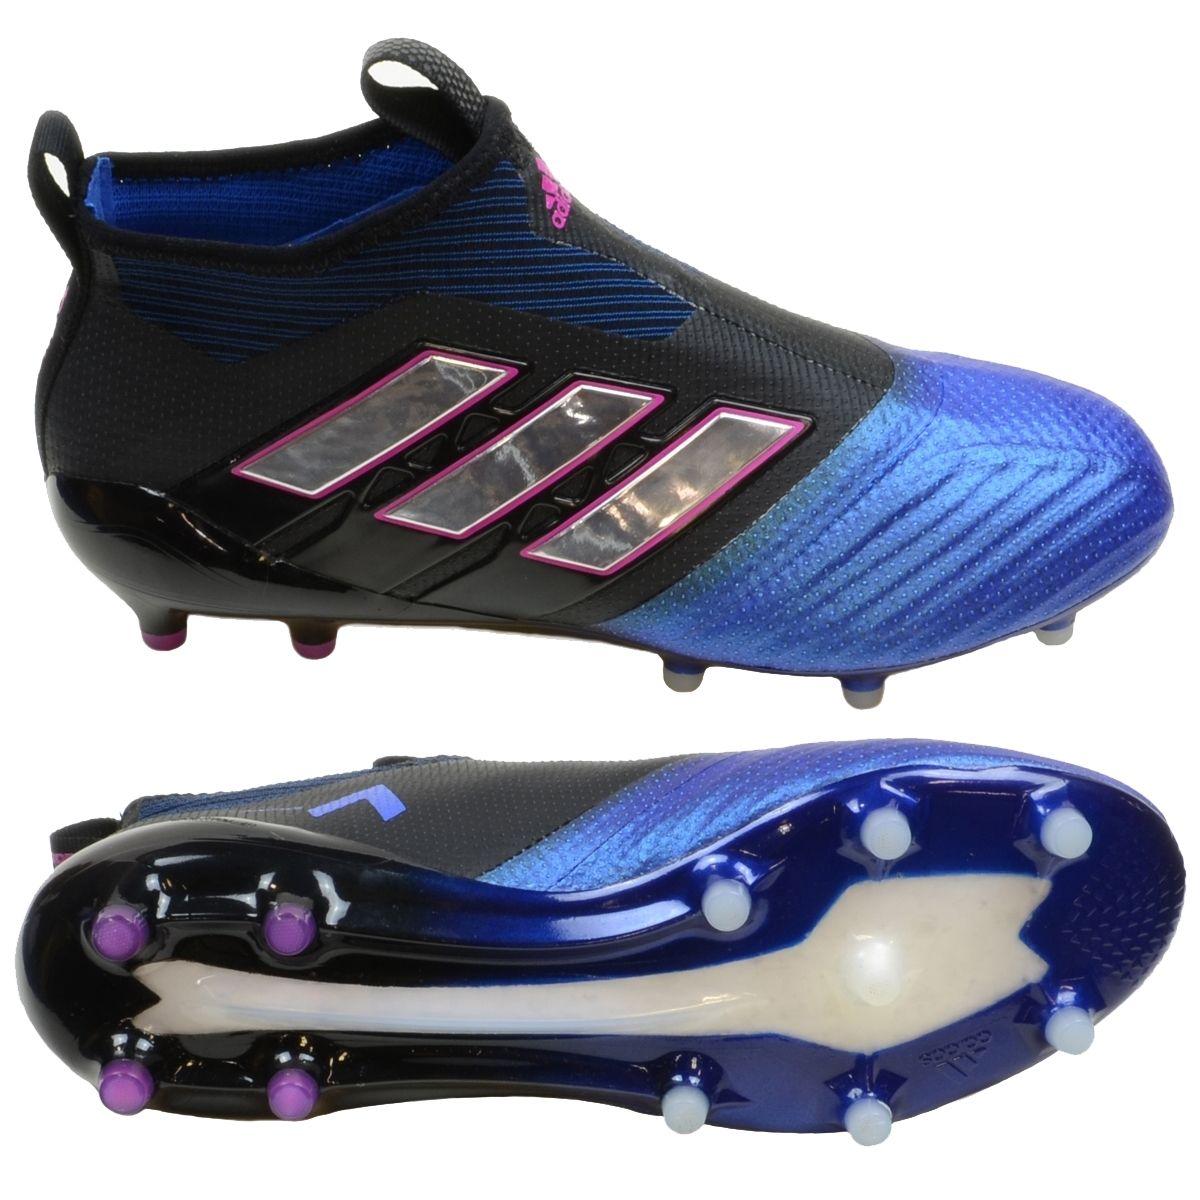 Adidas ACE 17+ PURECONTROL FG Soccer Cleats (BlackWhite